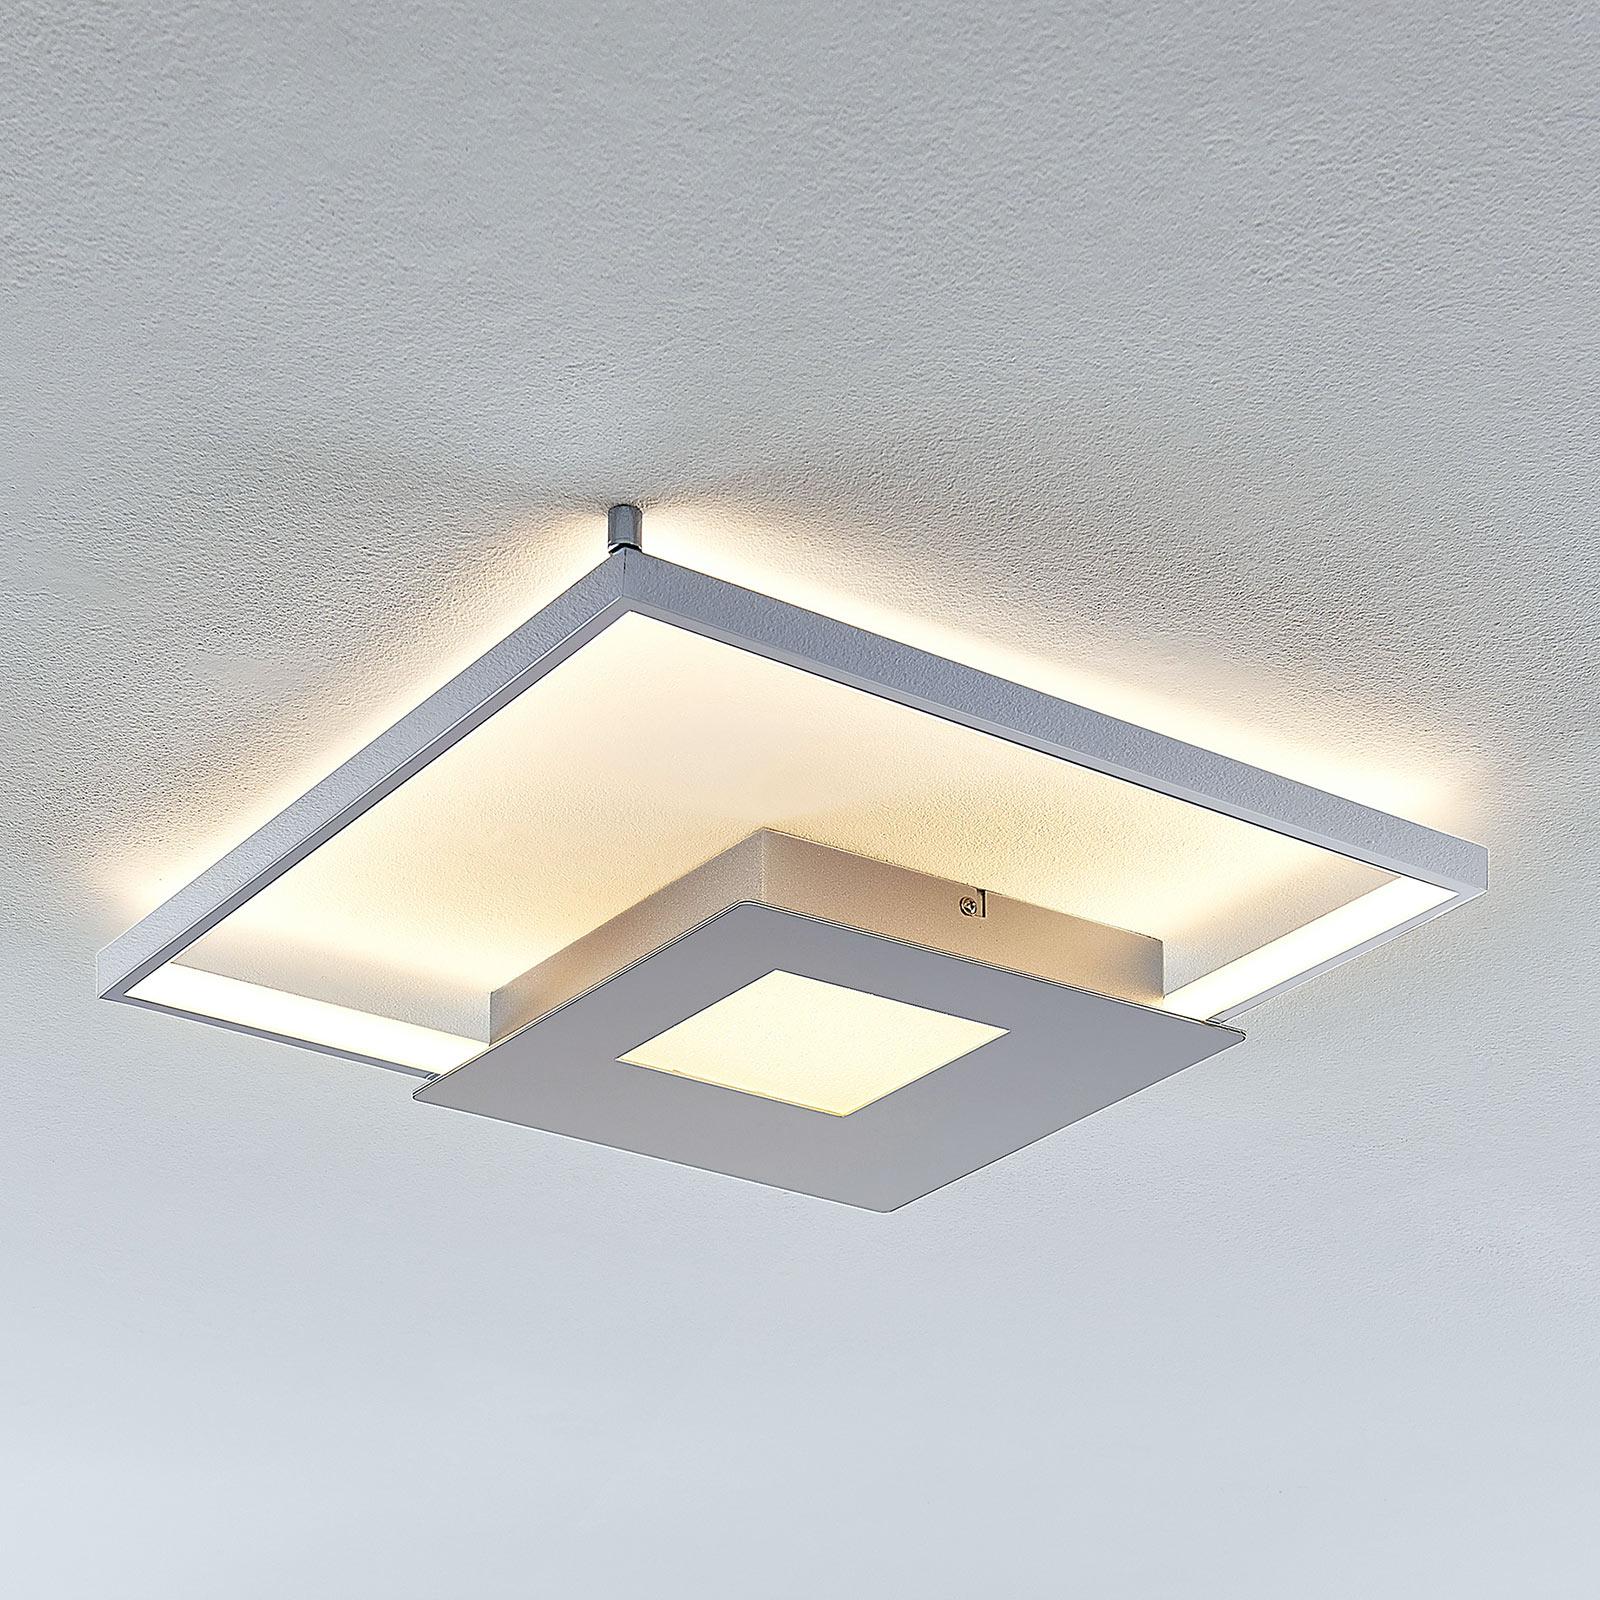 LED-taklampe Anays, kantet 42 cm